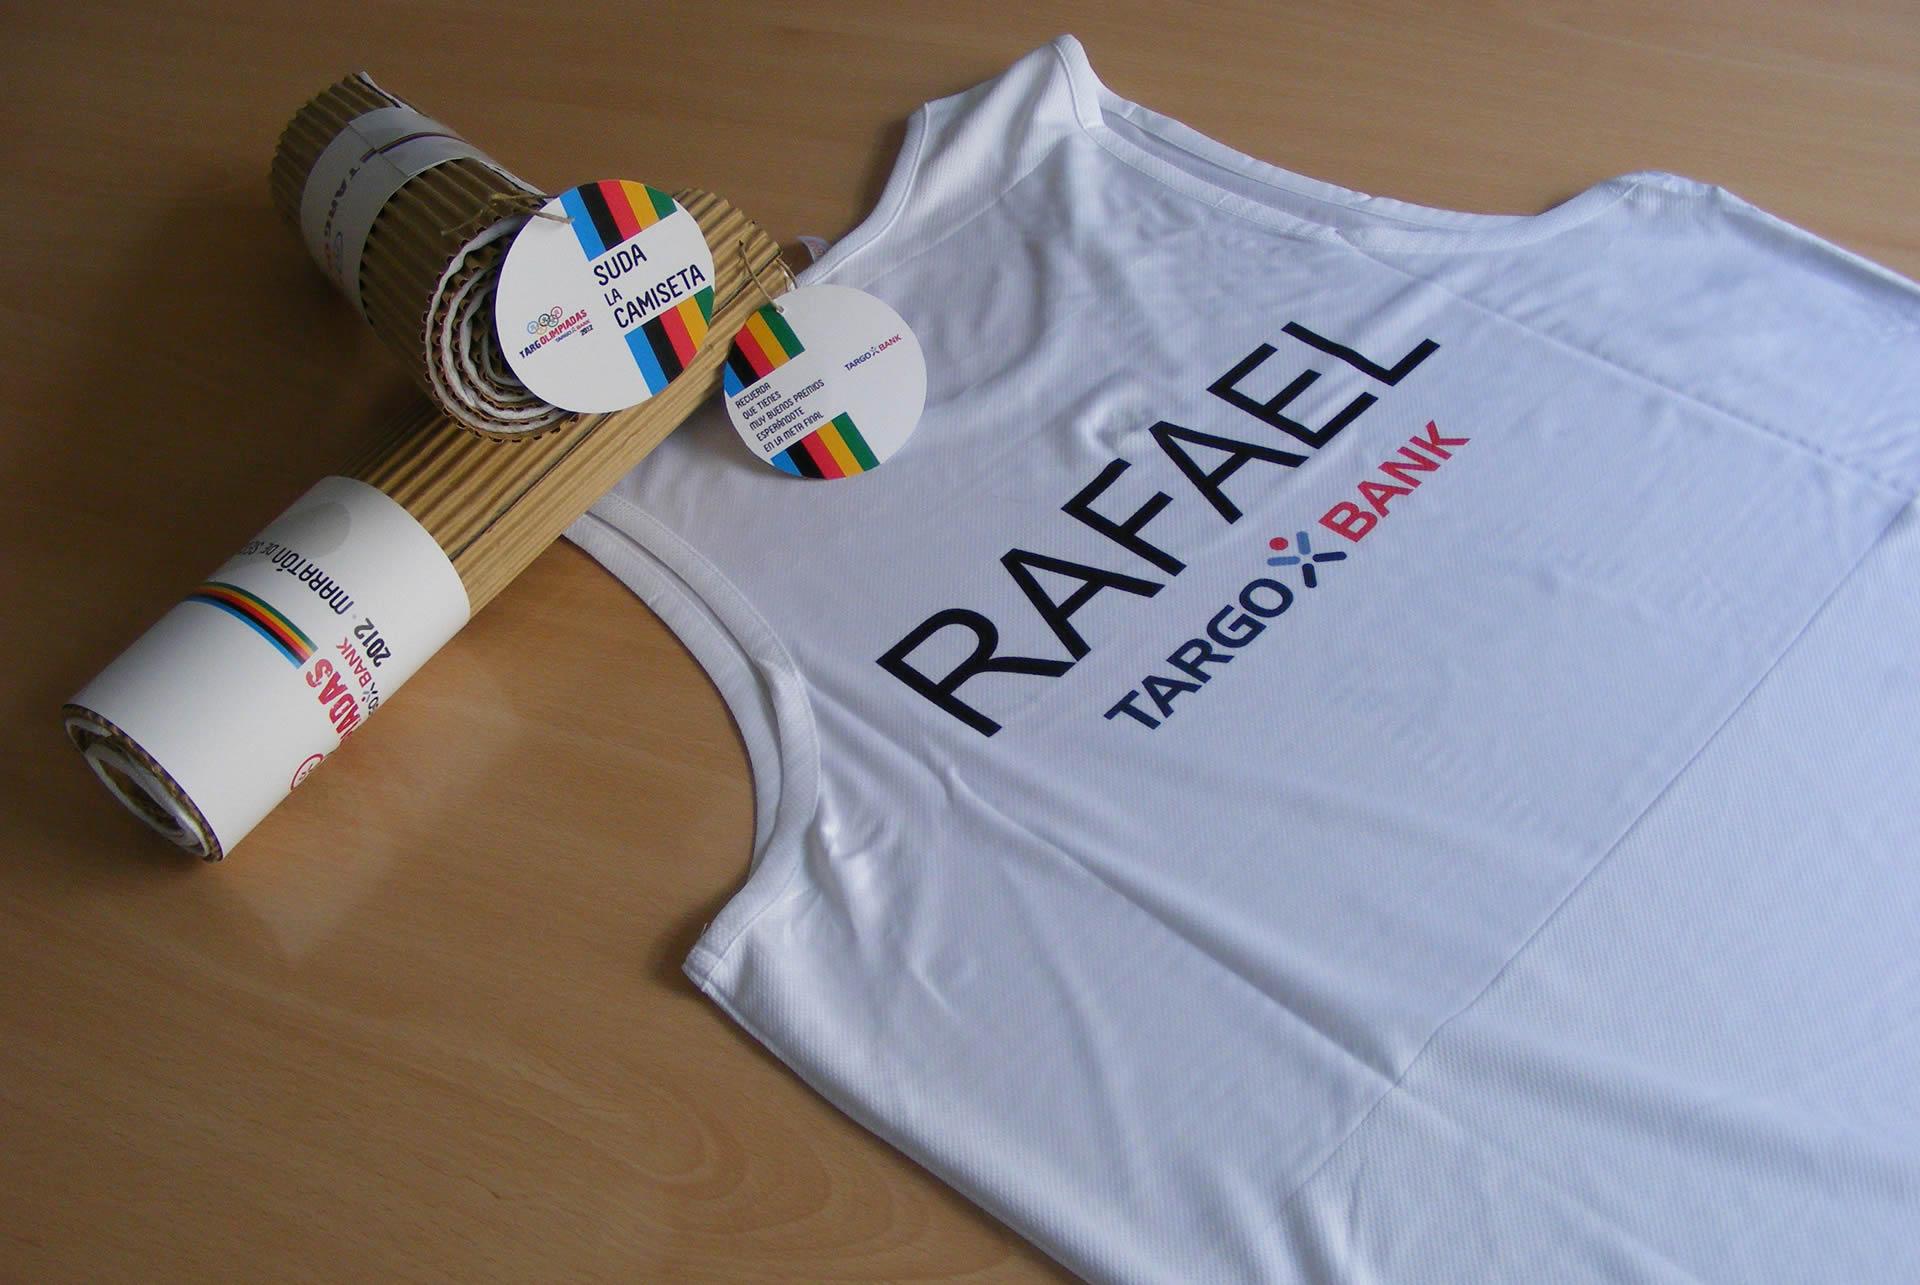 Targobank-camiseta-incentivación-comercial-babel